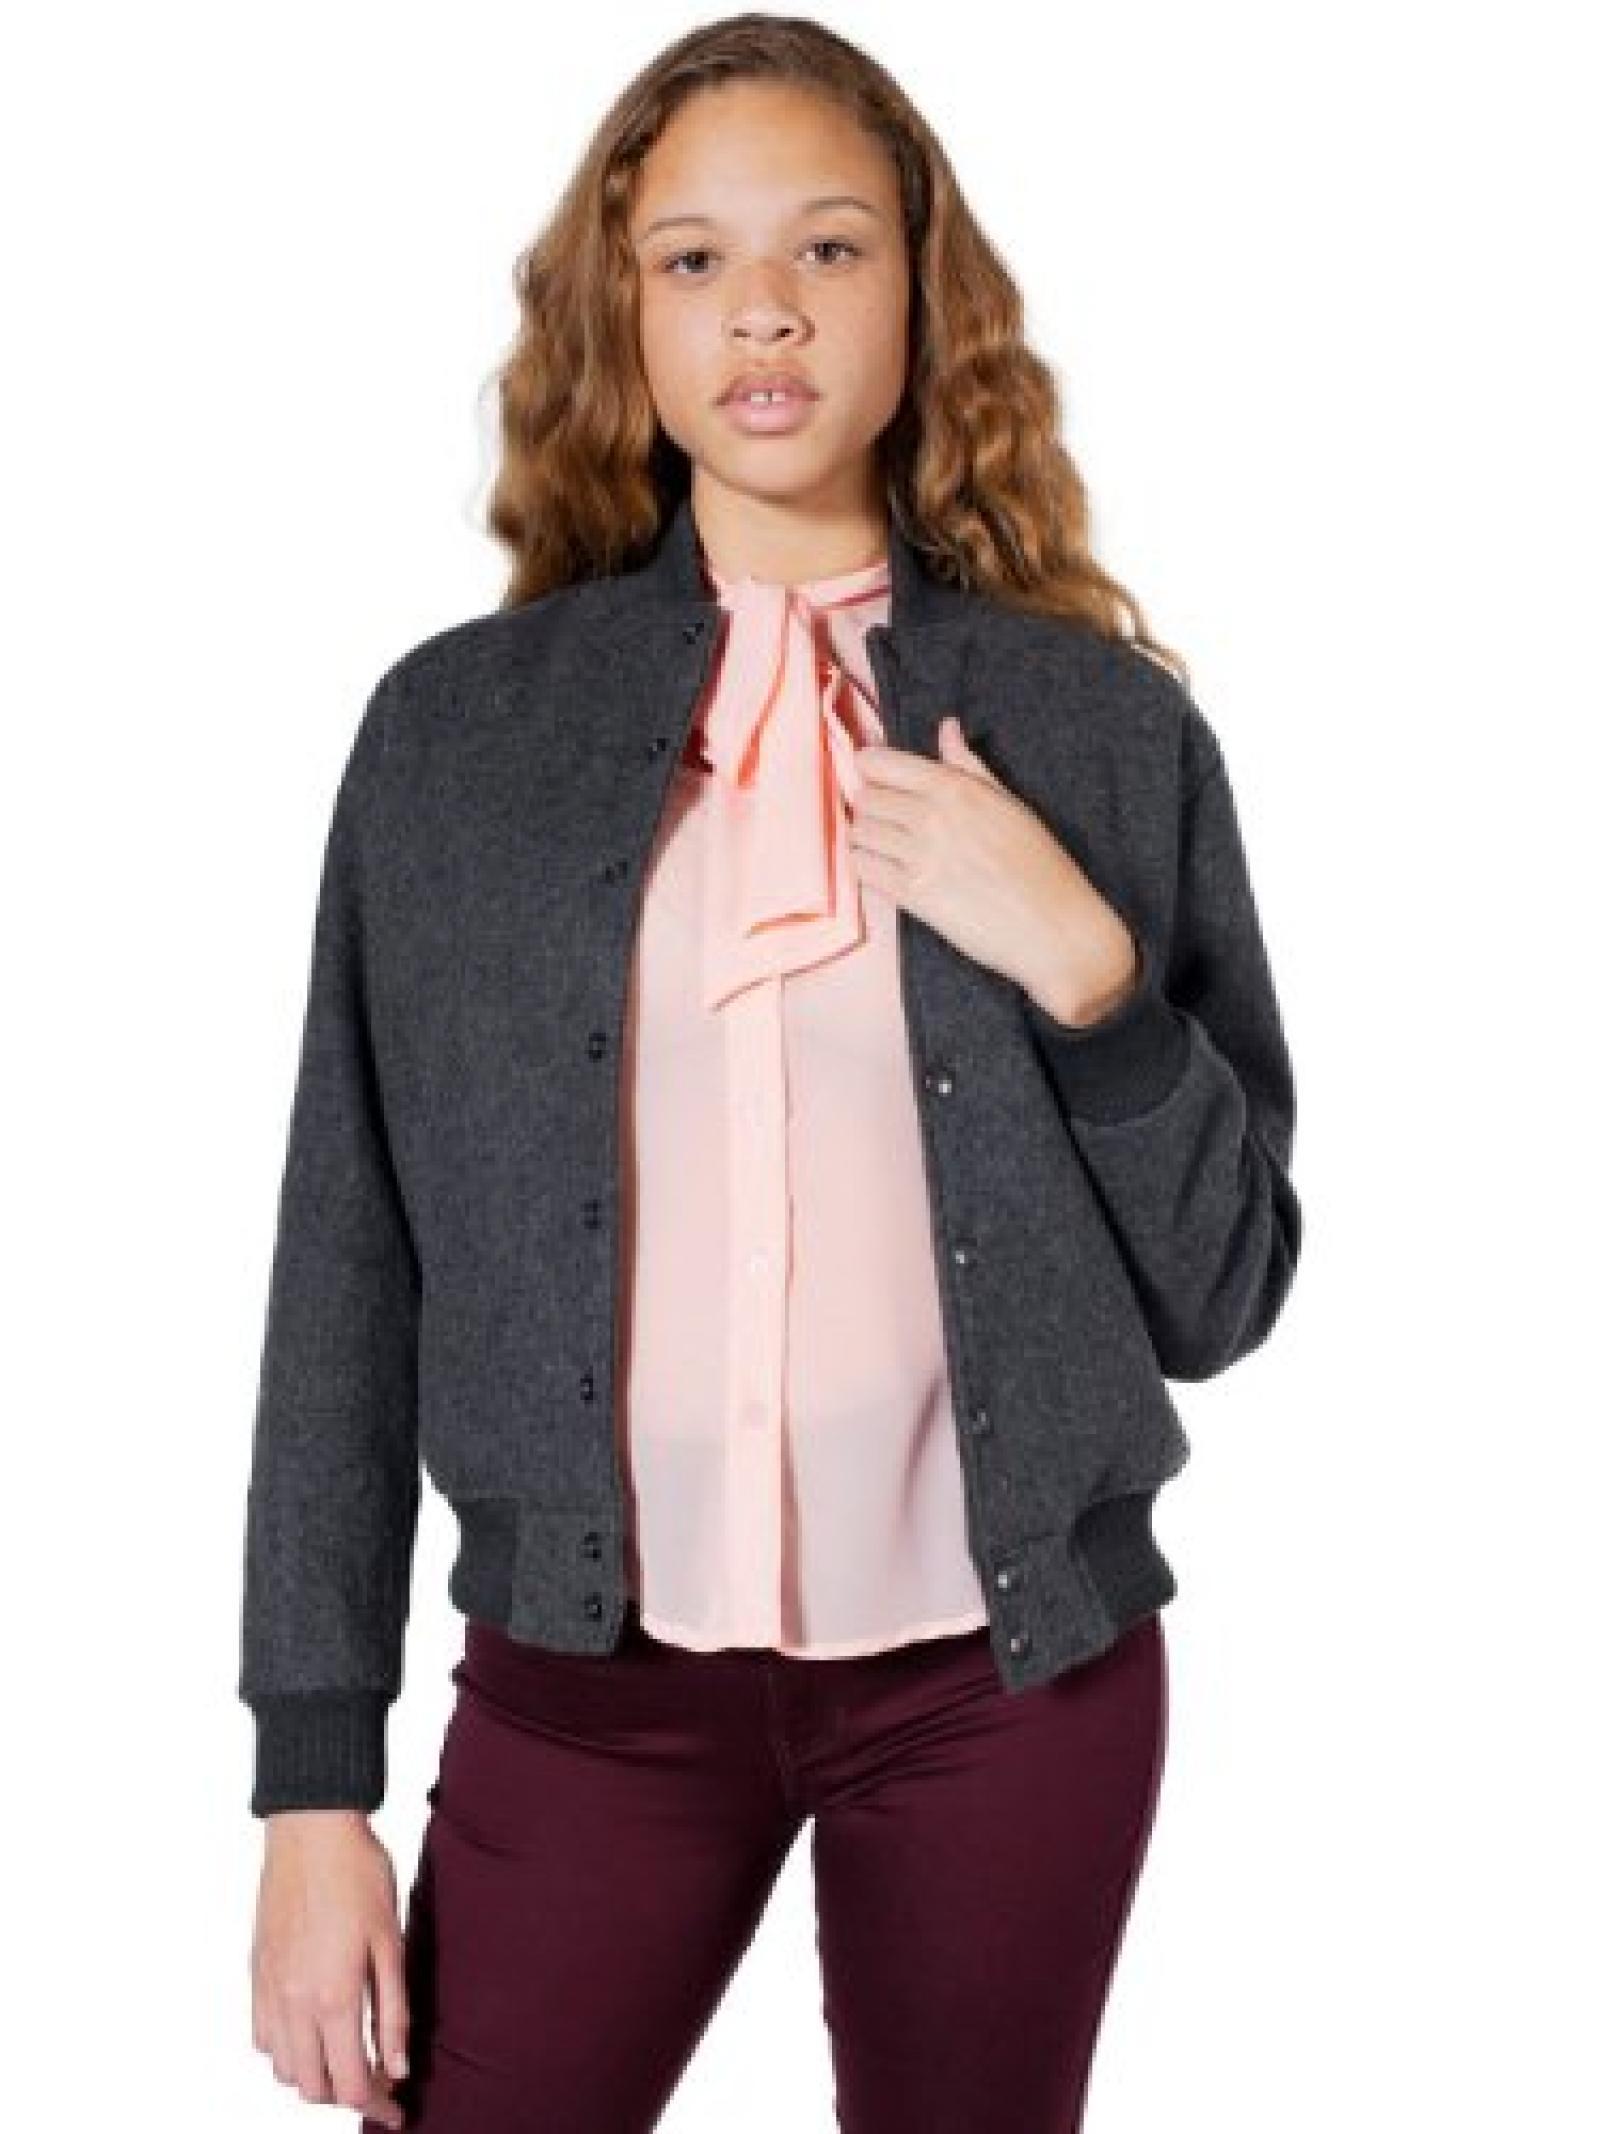 American Apparel Unisex Wool Club Jacket